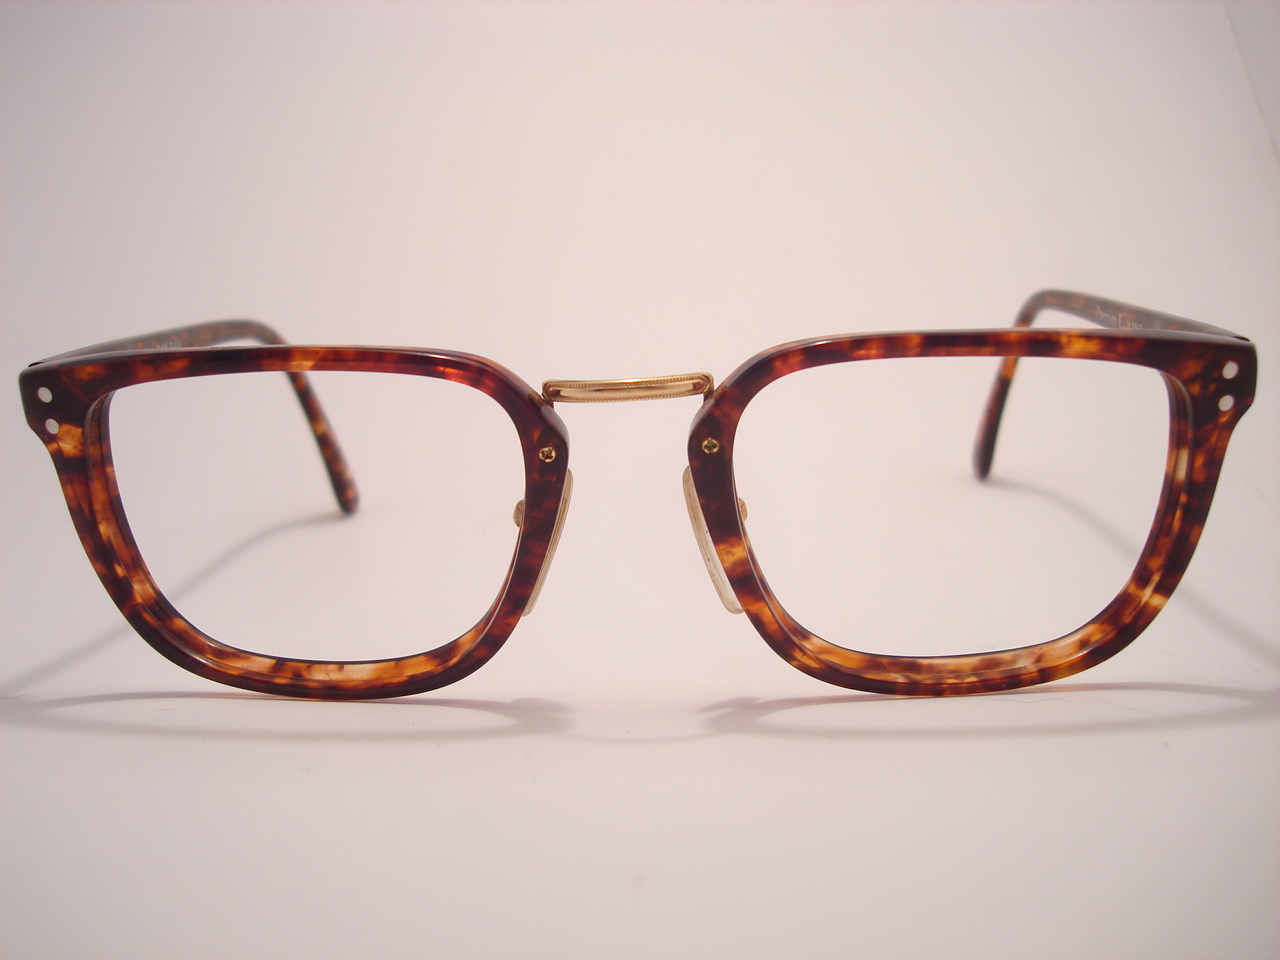 Ray Ban Vintage Glasses Frames : Ray Ban Vintage Eyeglasses